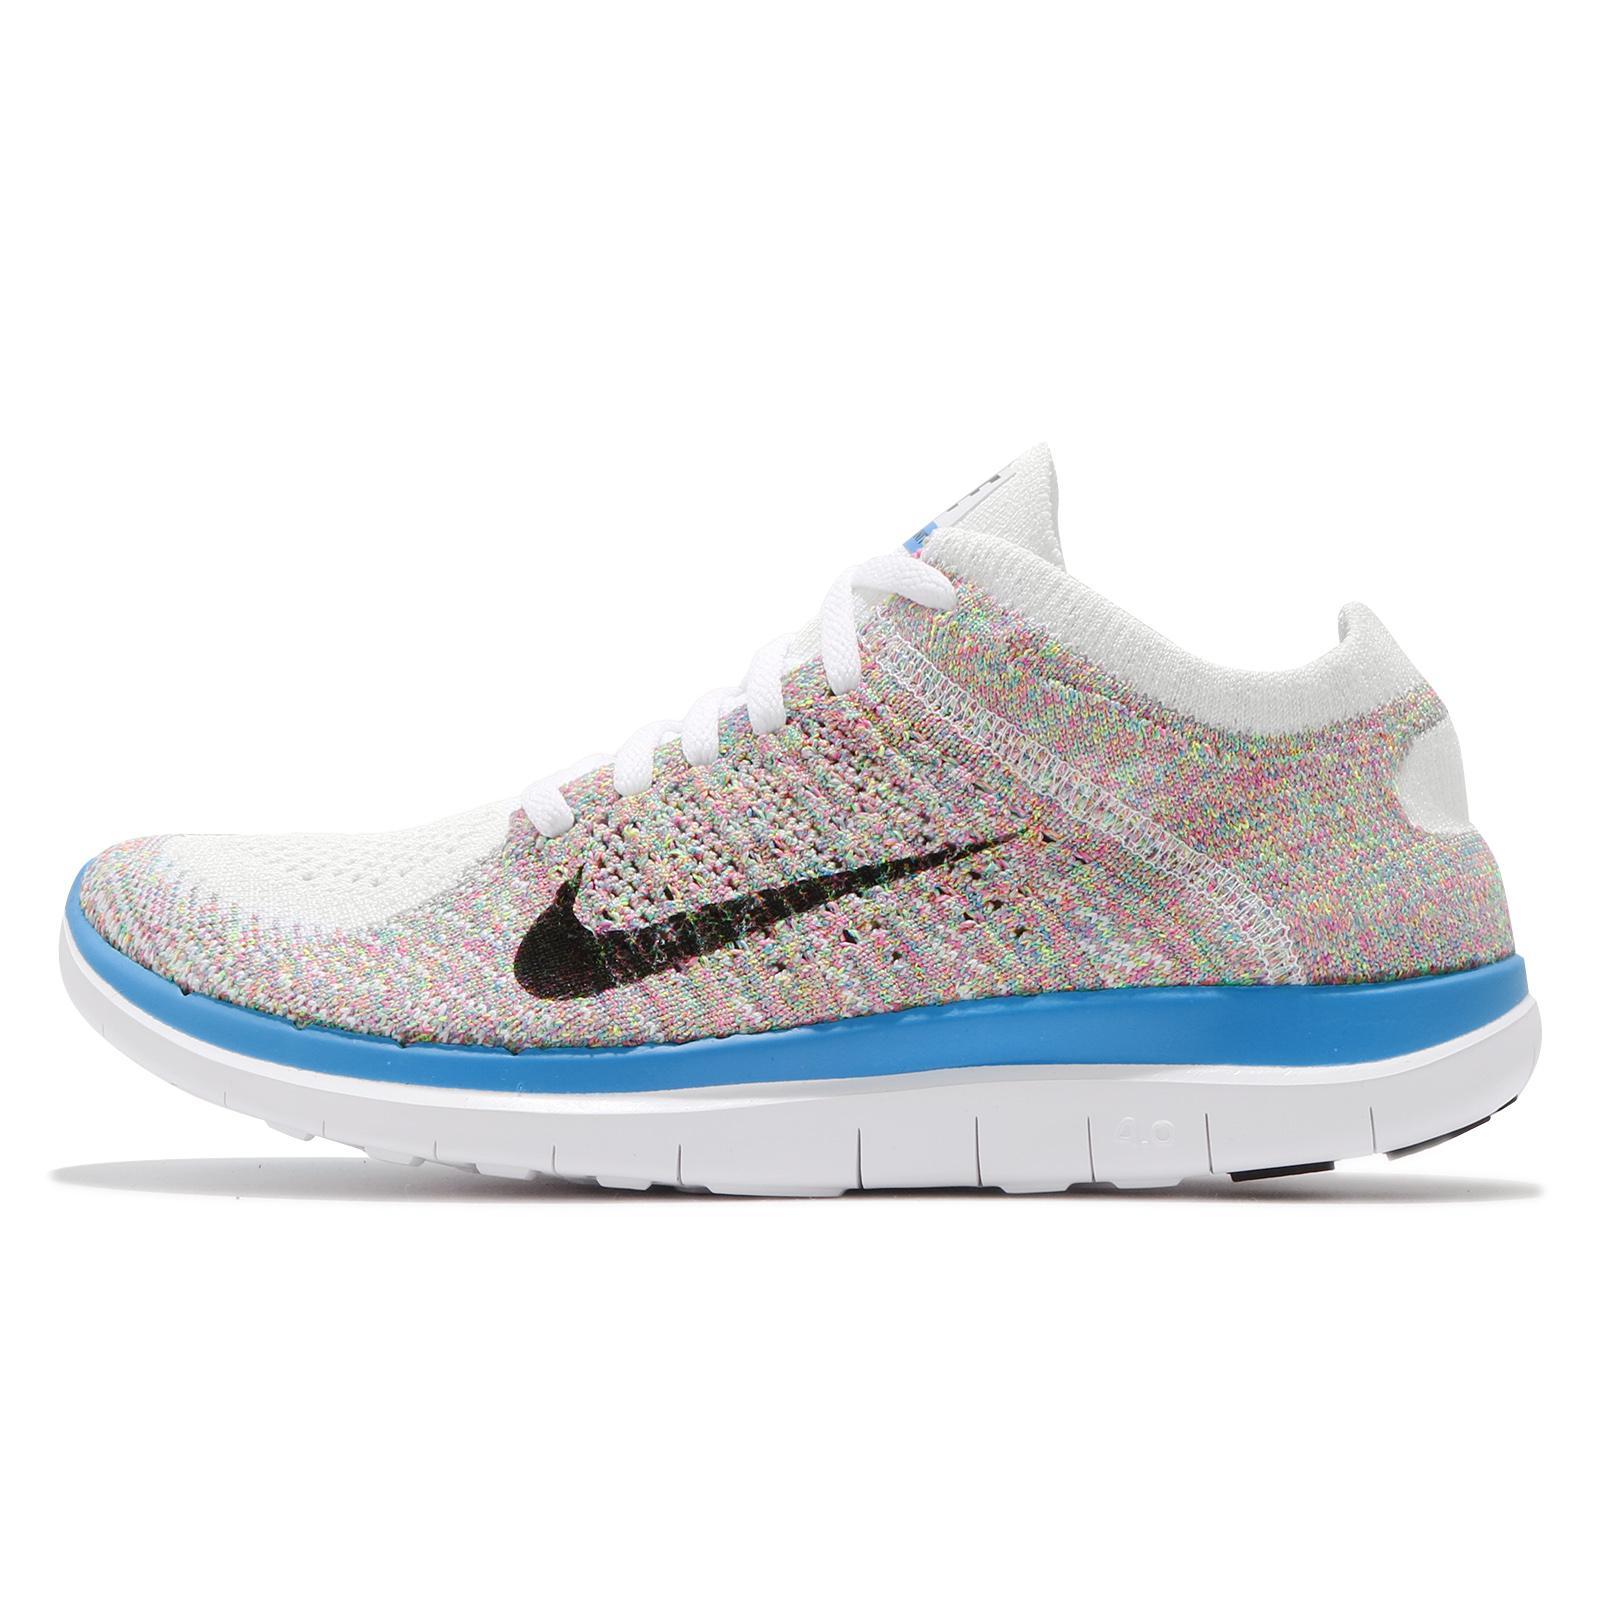 Nike Free Express Running Shoes Rainbow